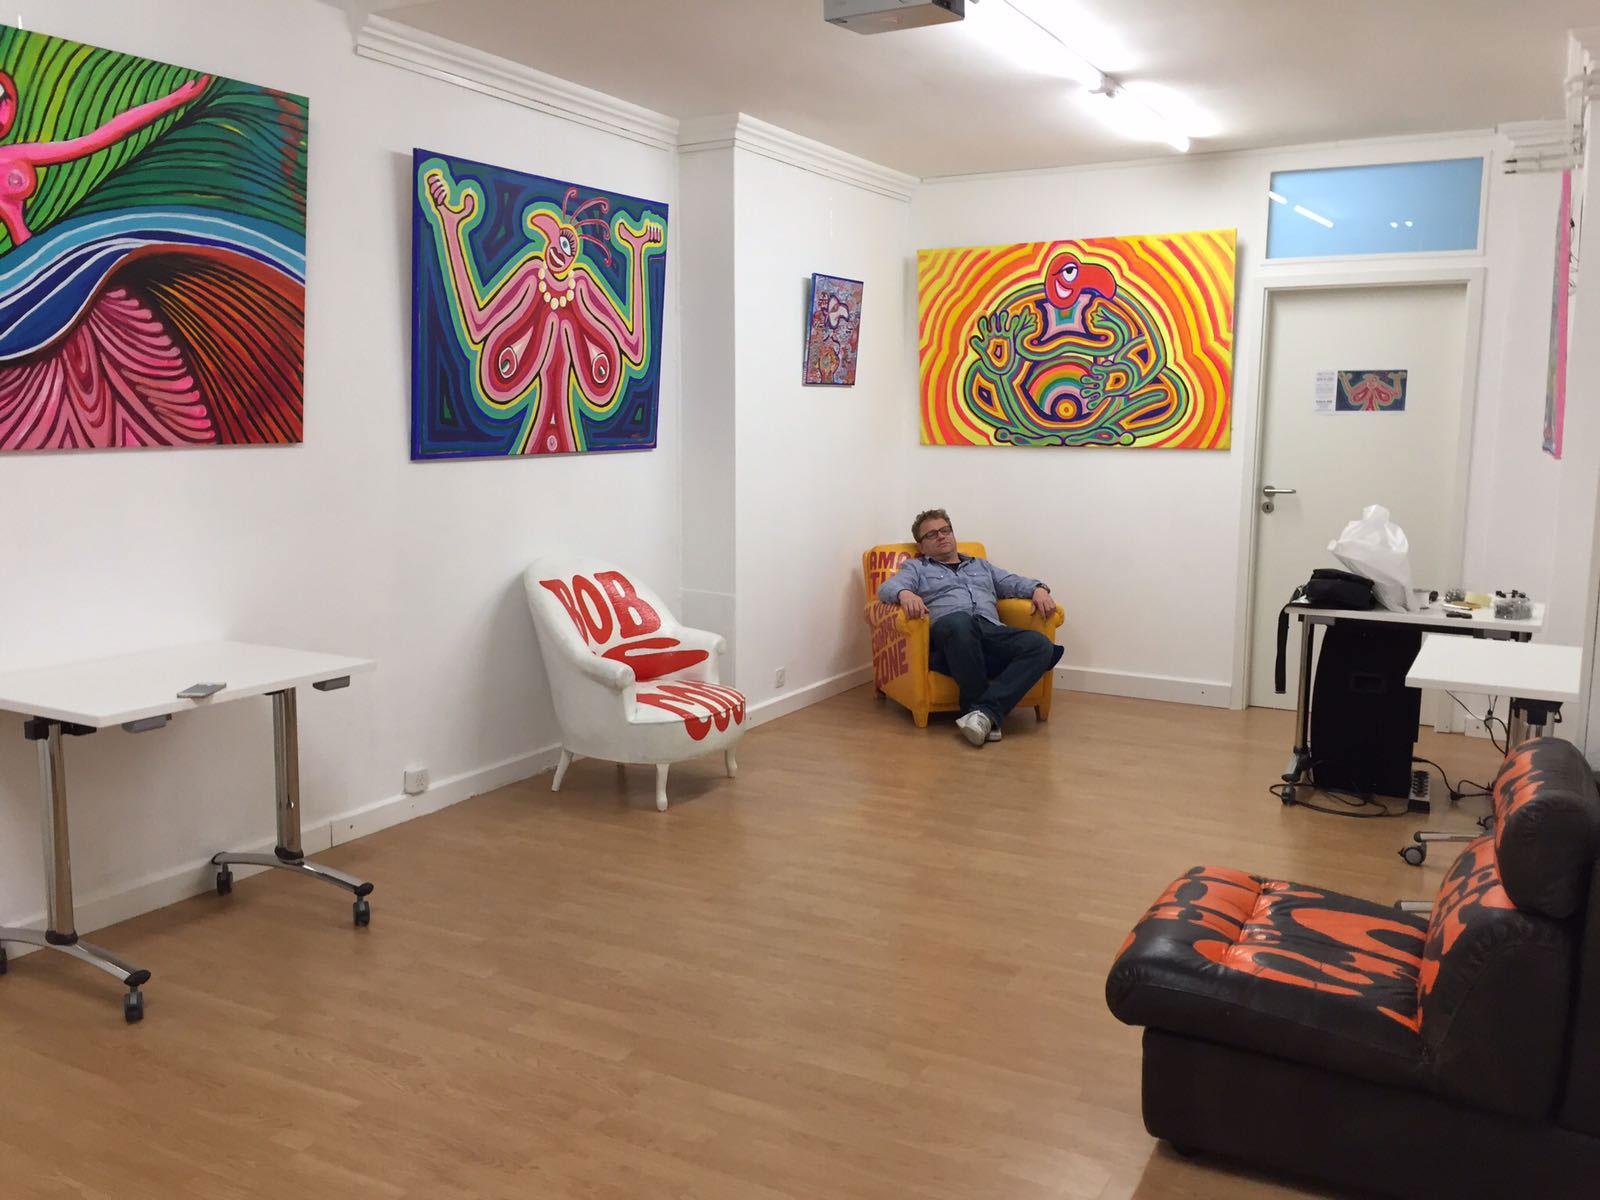 salle bajor salle polyvalente r union formation exposition en location gen ve eaux. Black Bedroom Furniture Sets. Home Design Ideas